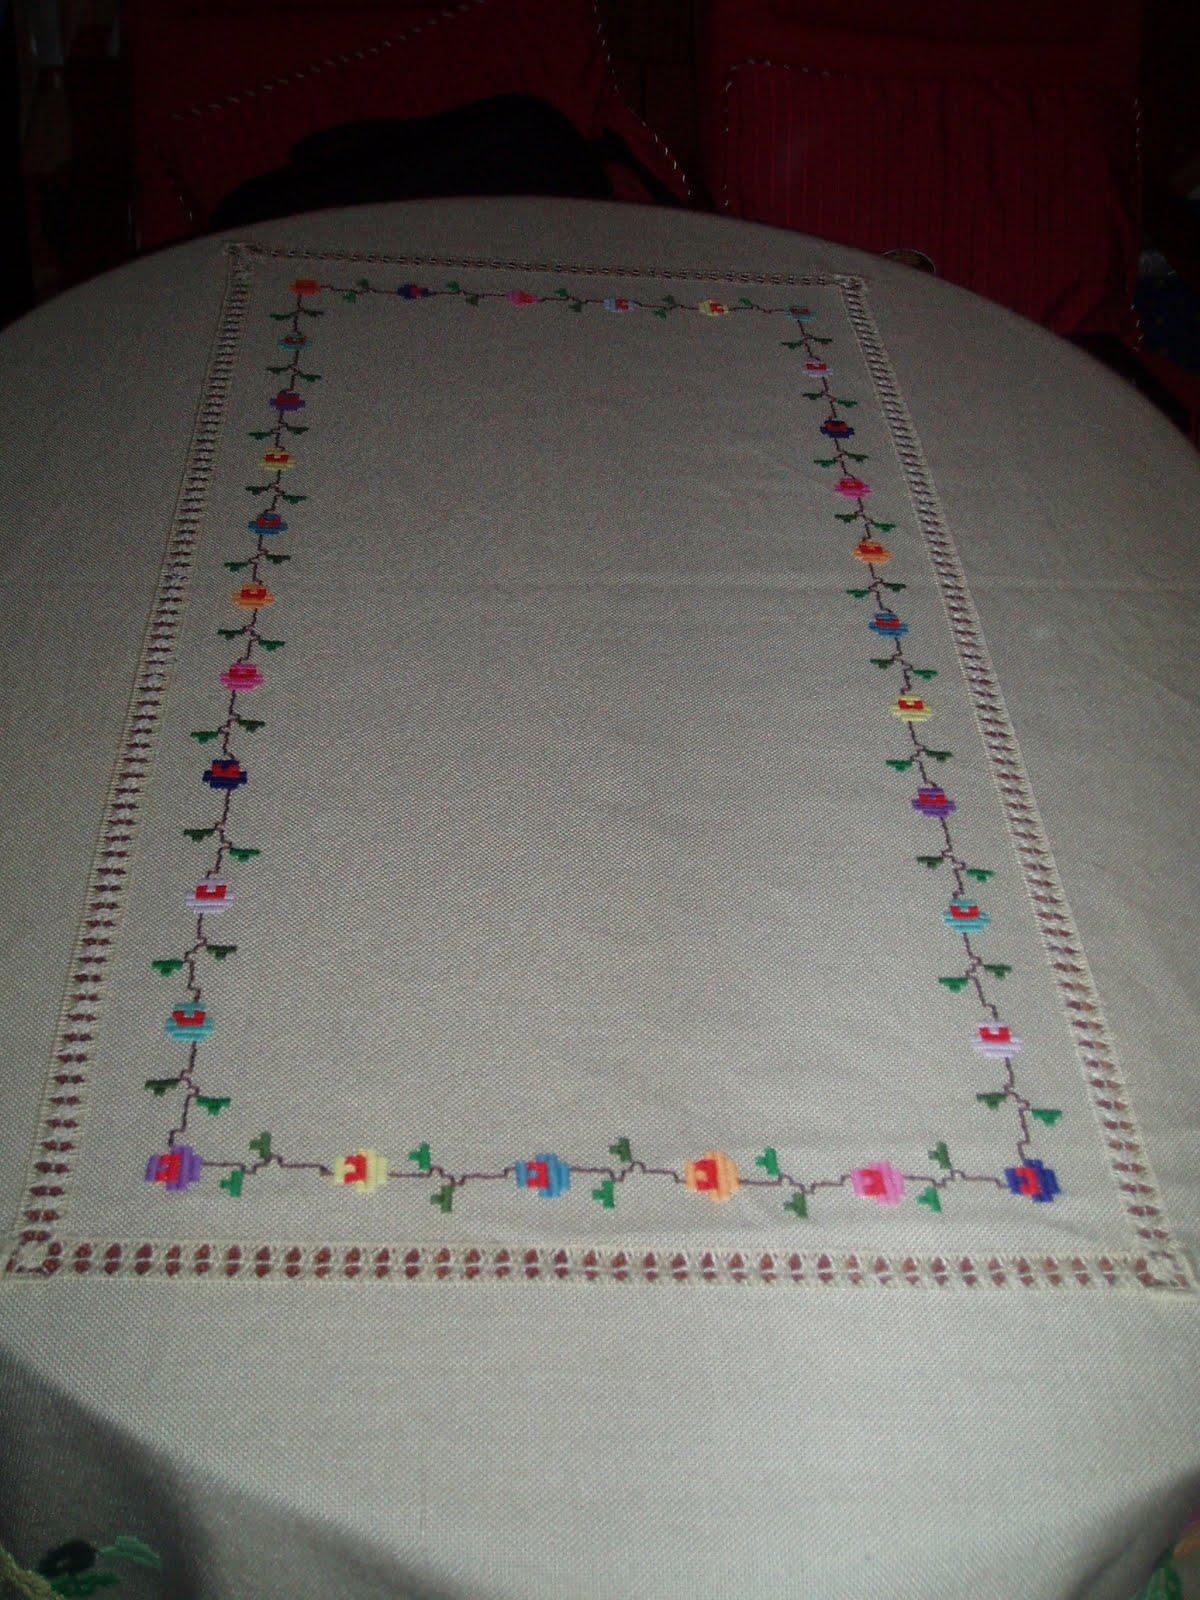 Manteles de mesa bordados great valor unitario pesos - Manteles de mesa bordados ...